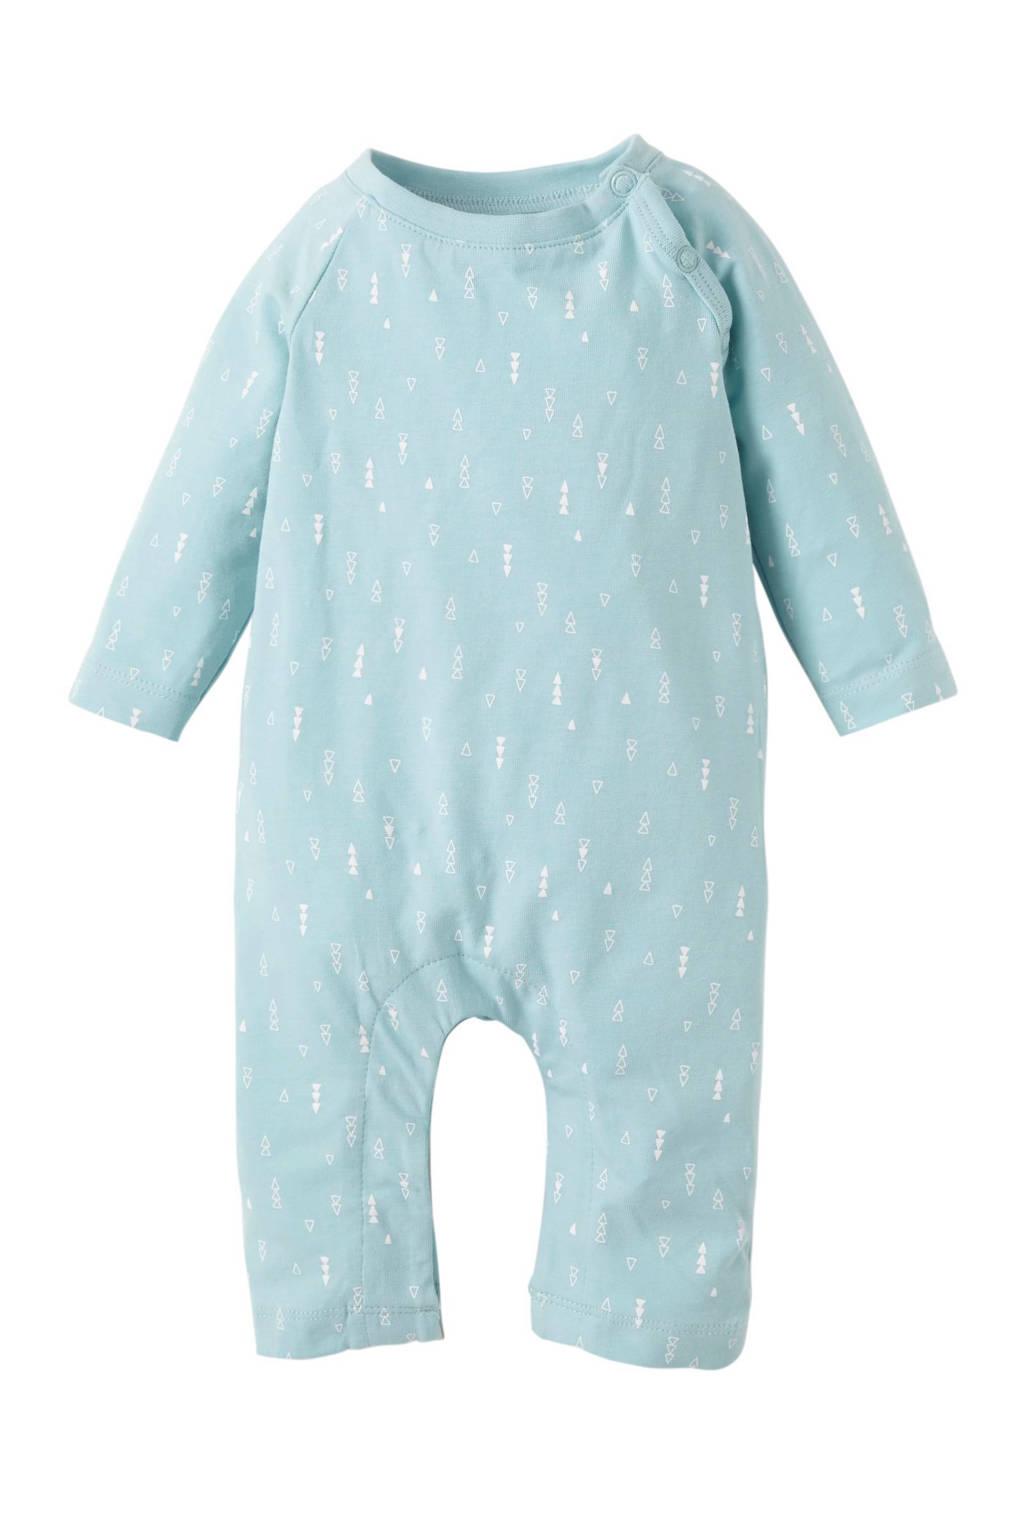 name it BABY newborn baby boxpak Delucious, Mintgroen/wit